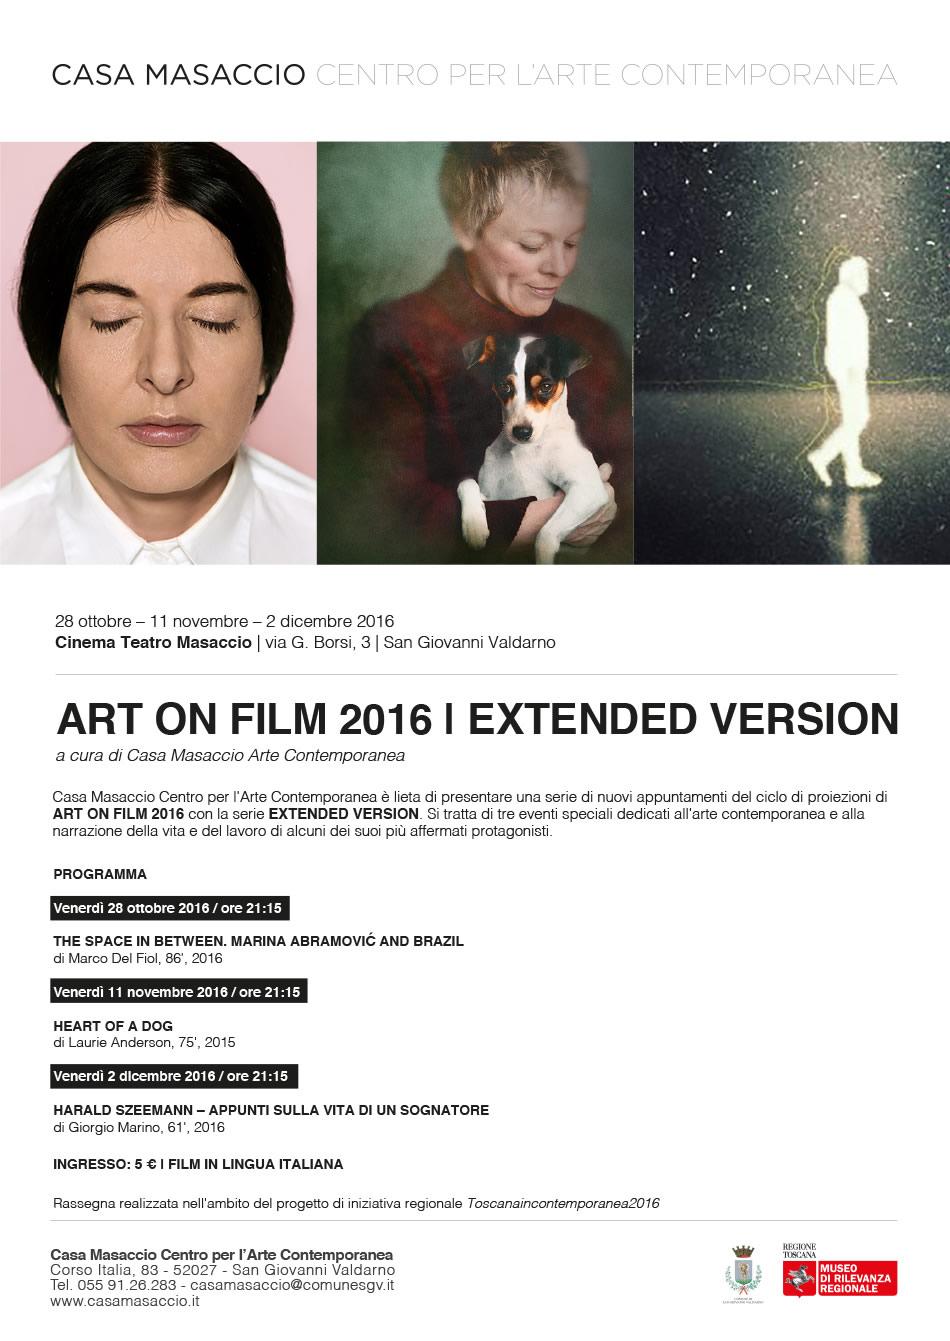 art-on-film_manifesto_extended-version